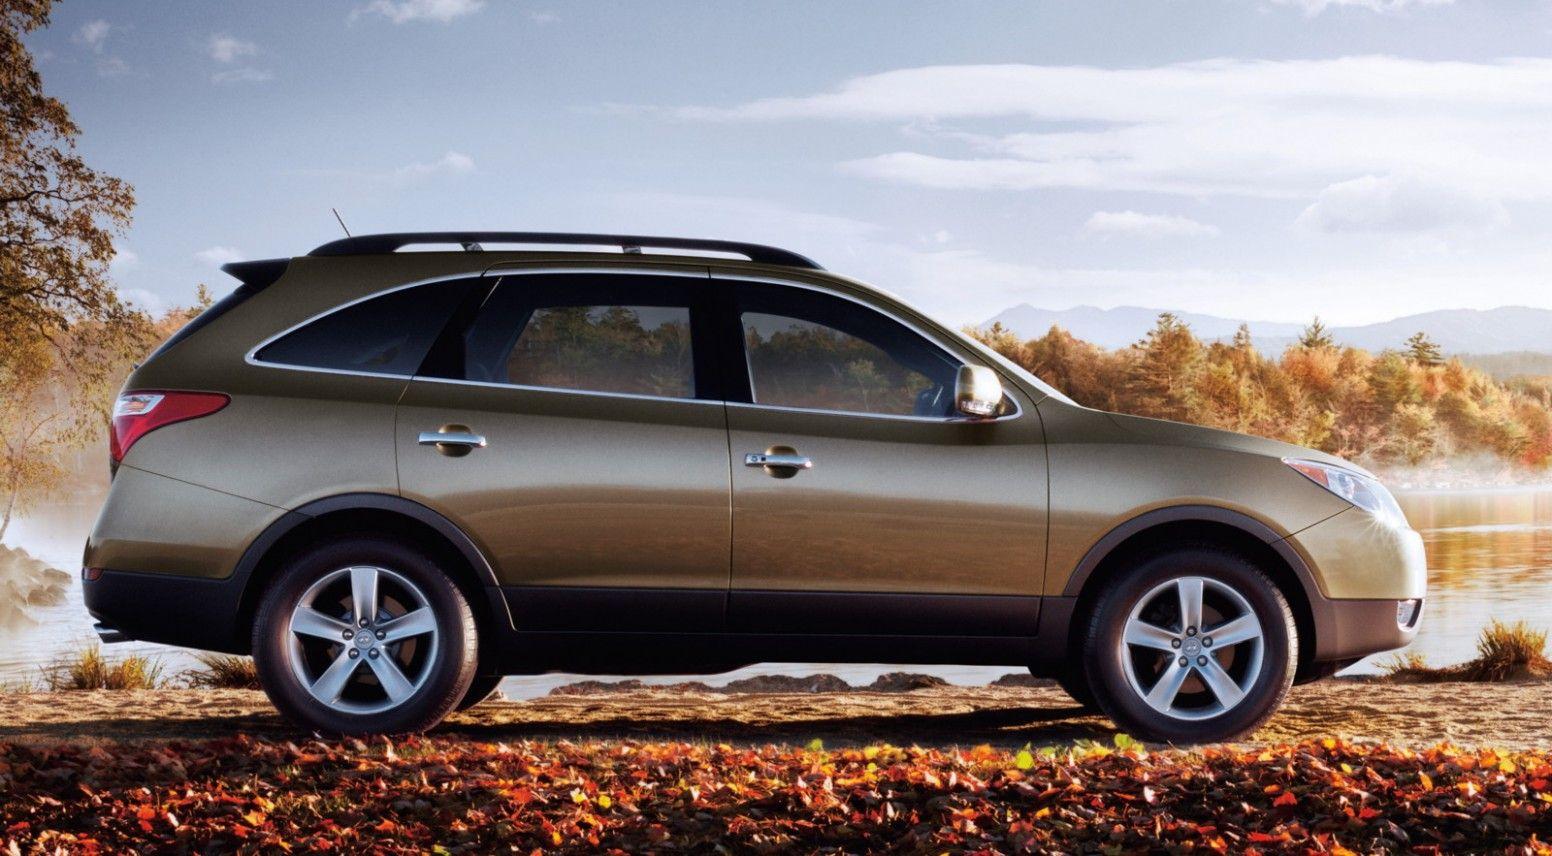 The Reasons Why We Love 4 Hyundai Veracruz Design The Reasons